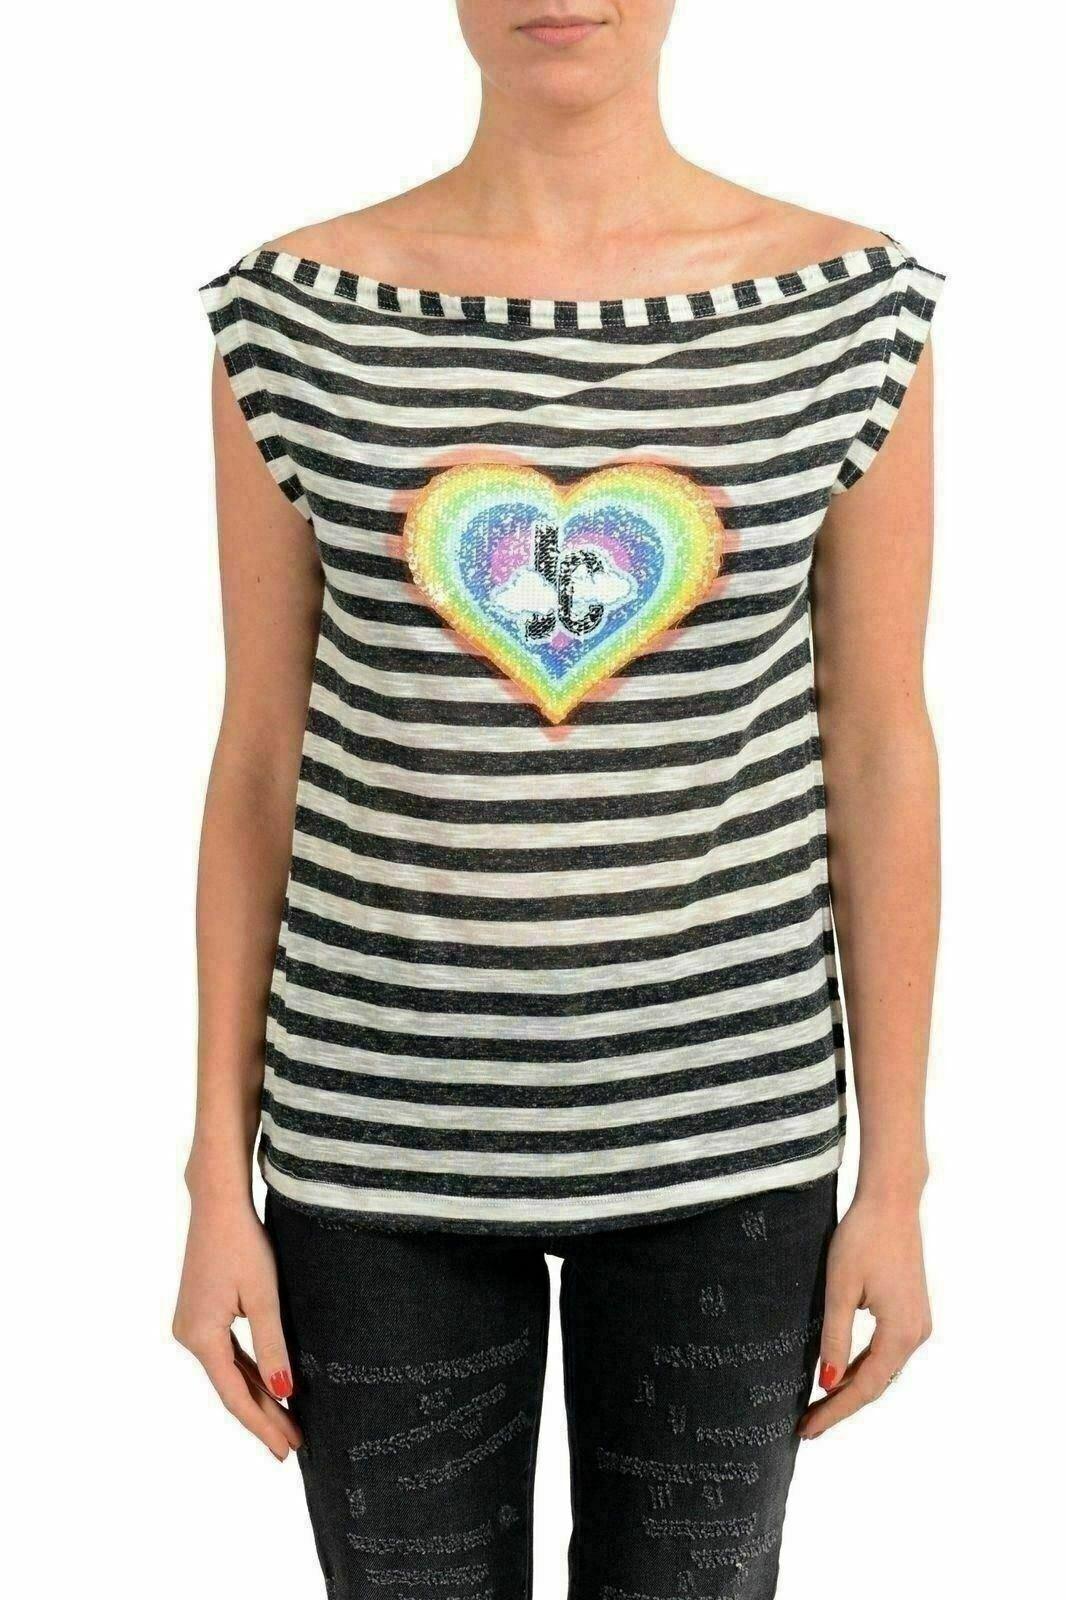 Just Cavalli Linen Multi-Farbe Striped Embellished Woherren T-Shirt US S IT 40